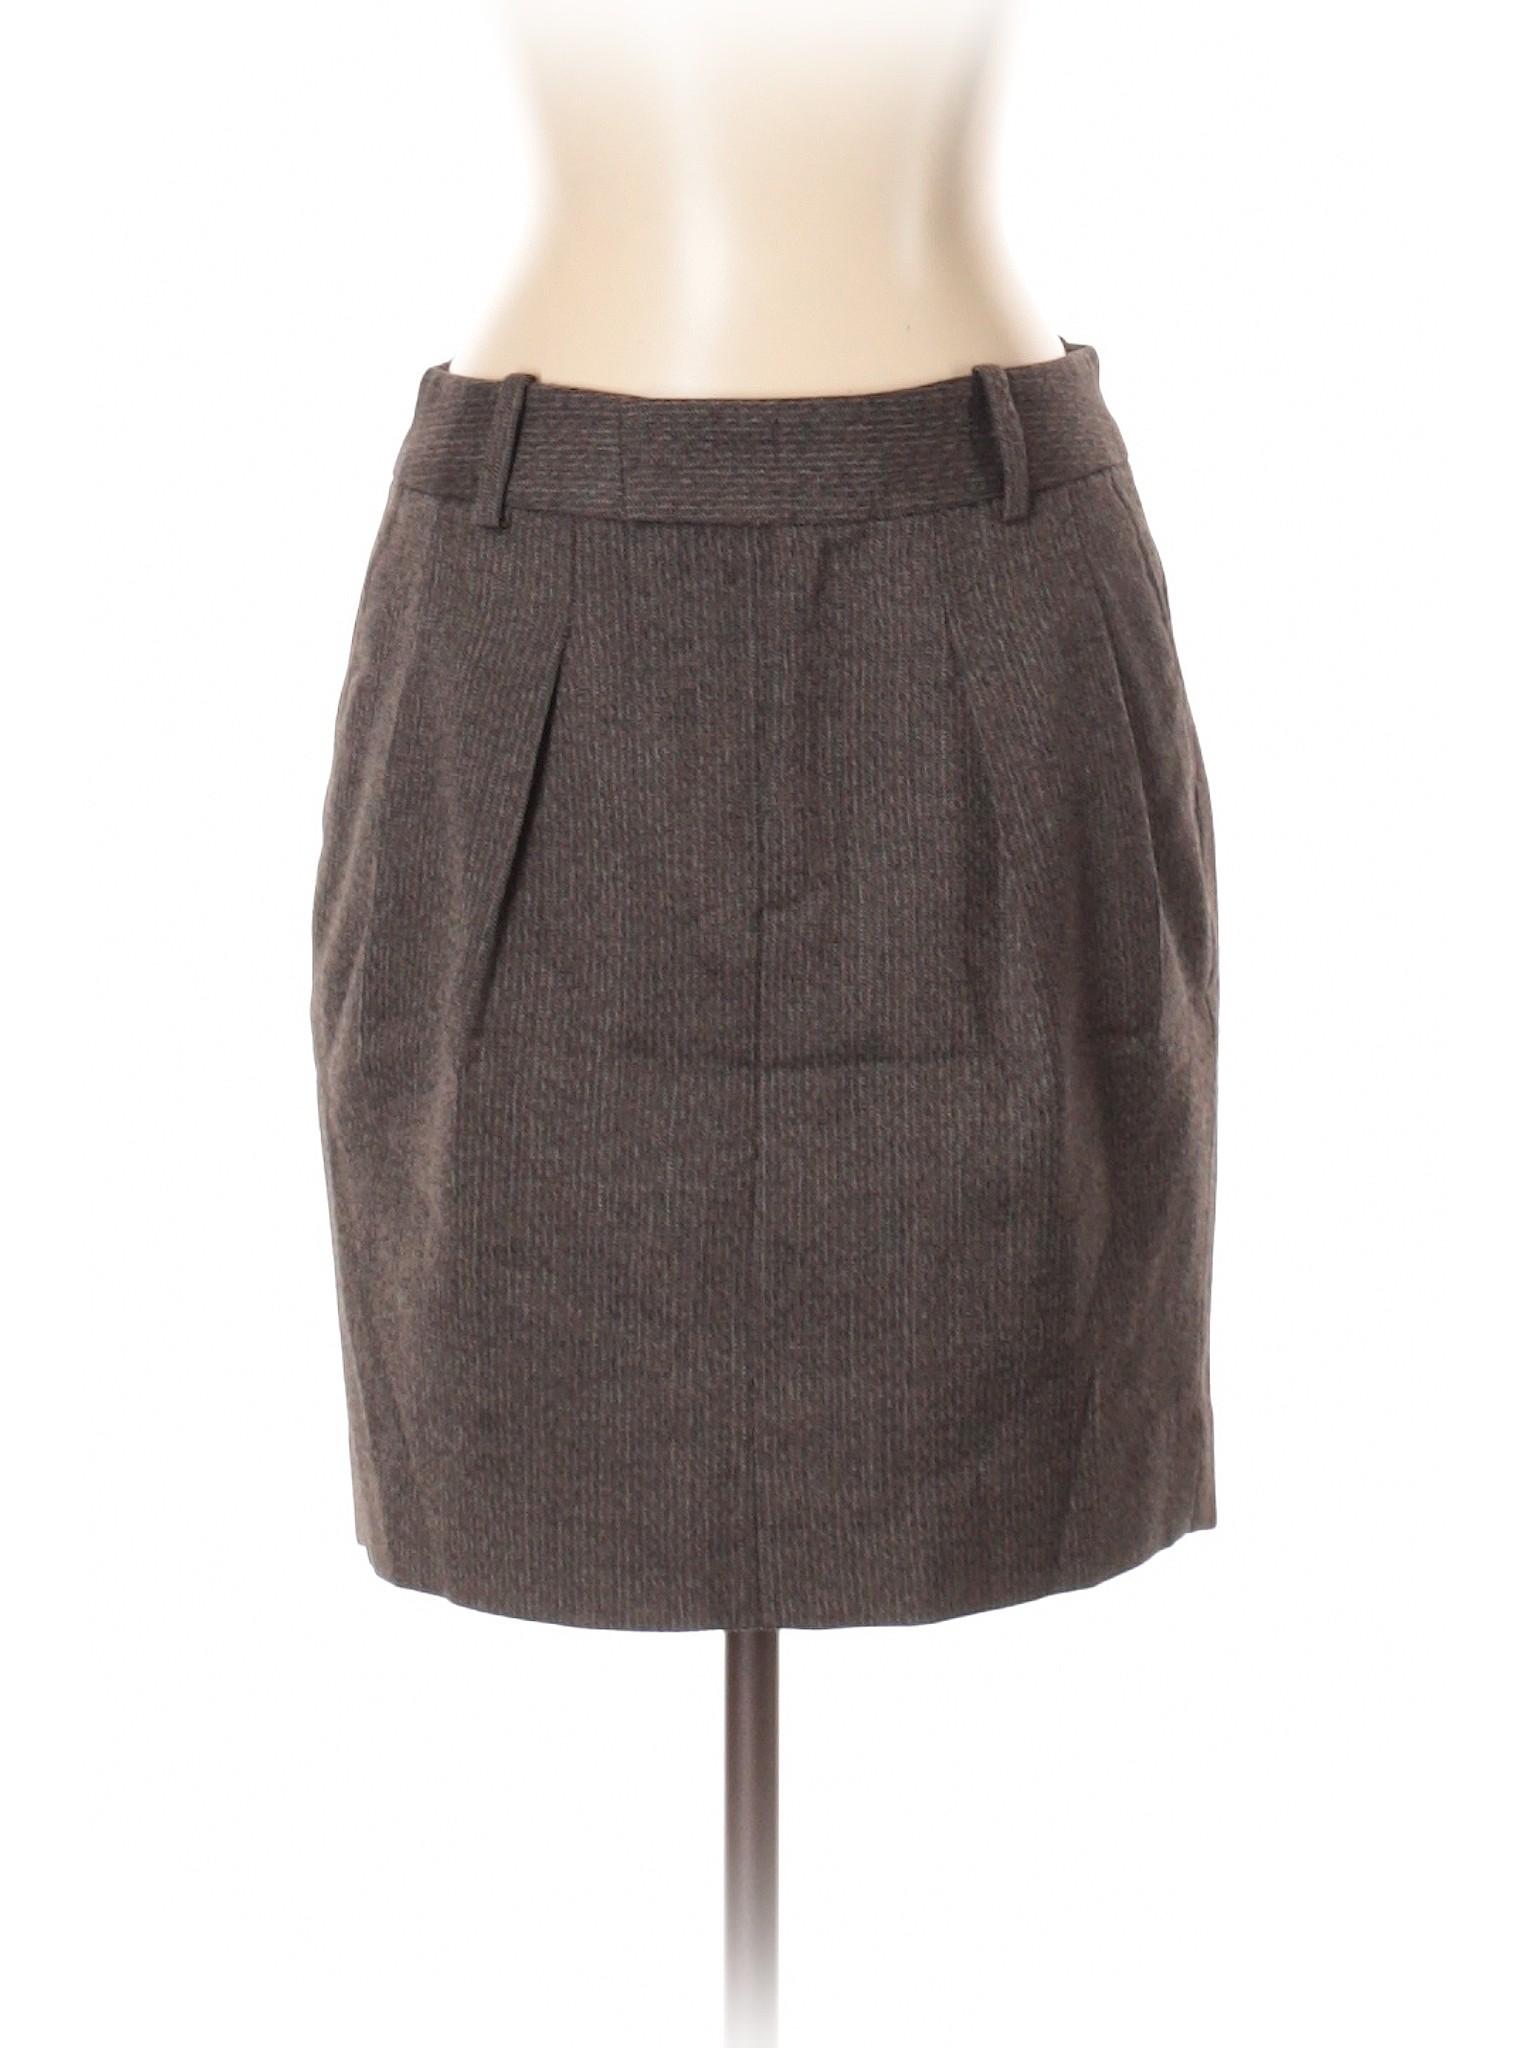 winter Skirt winter Skirt Leisure Gap Wool winter Leisure Gap Leisure Skirt Wool Gap Leisure Wool EPTRHqn0w0